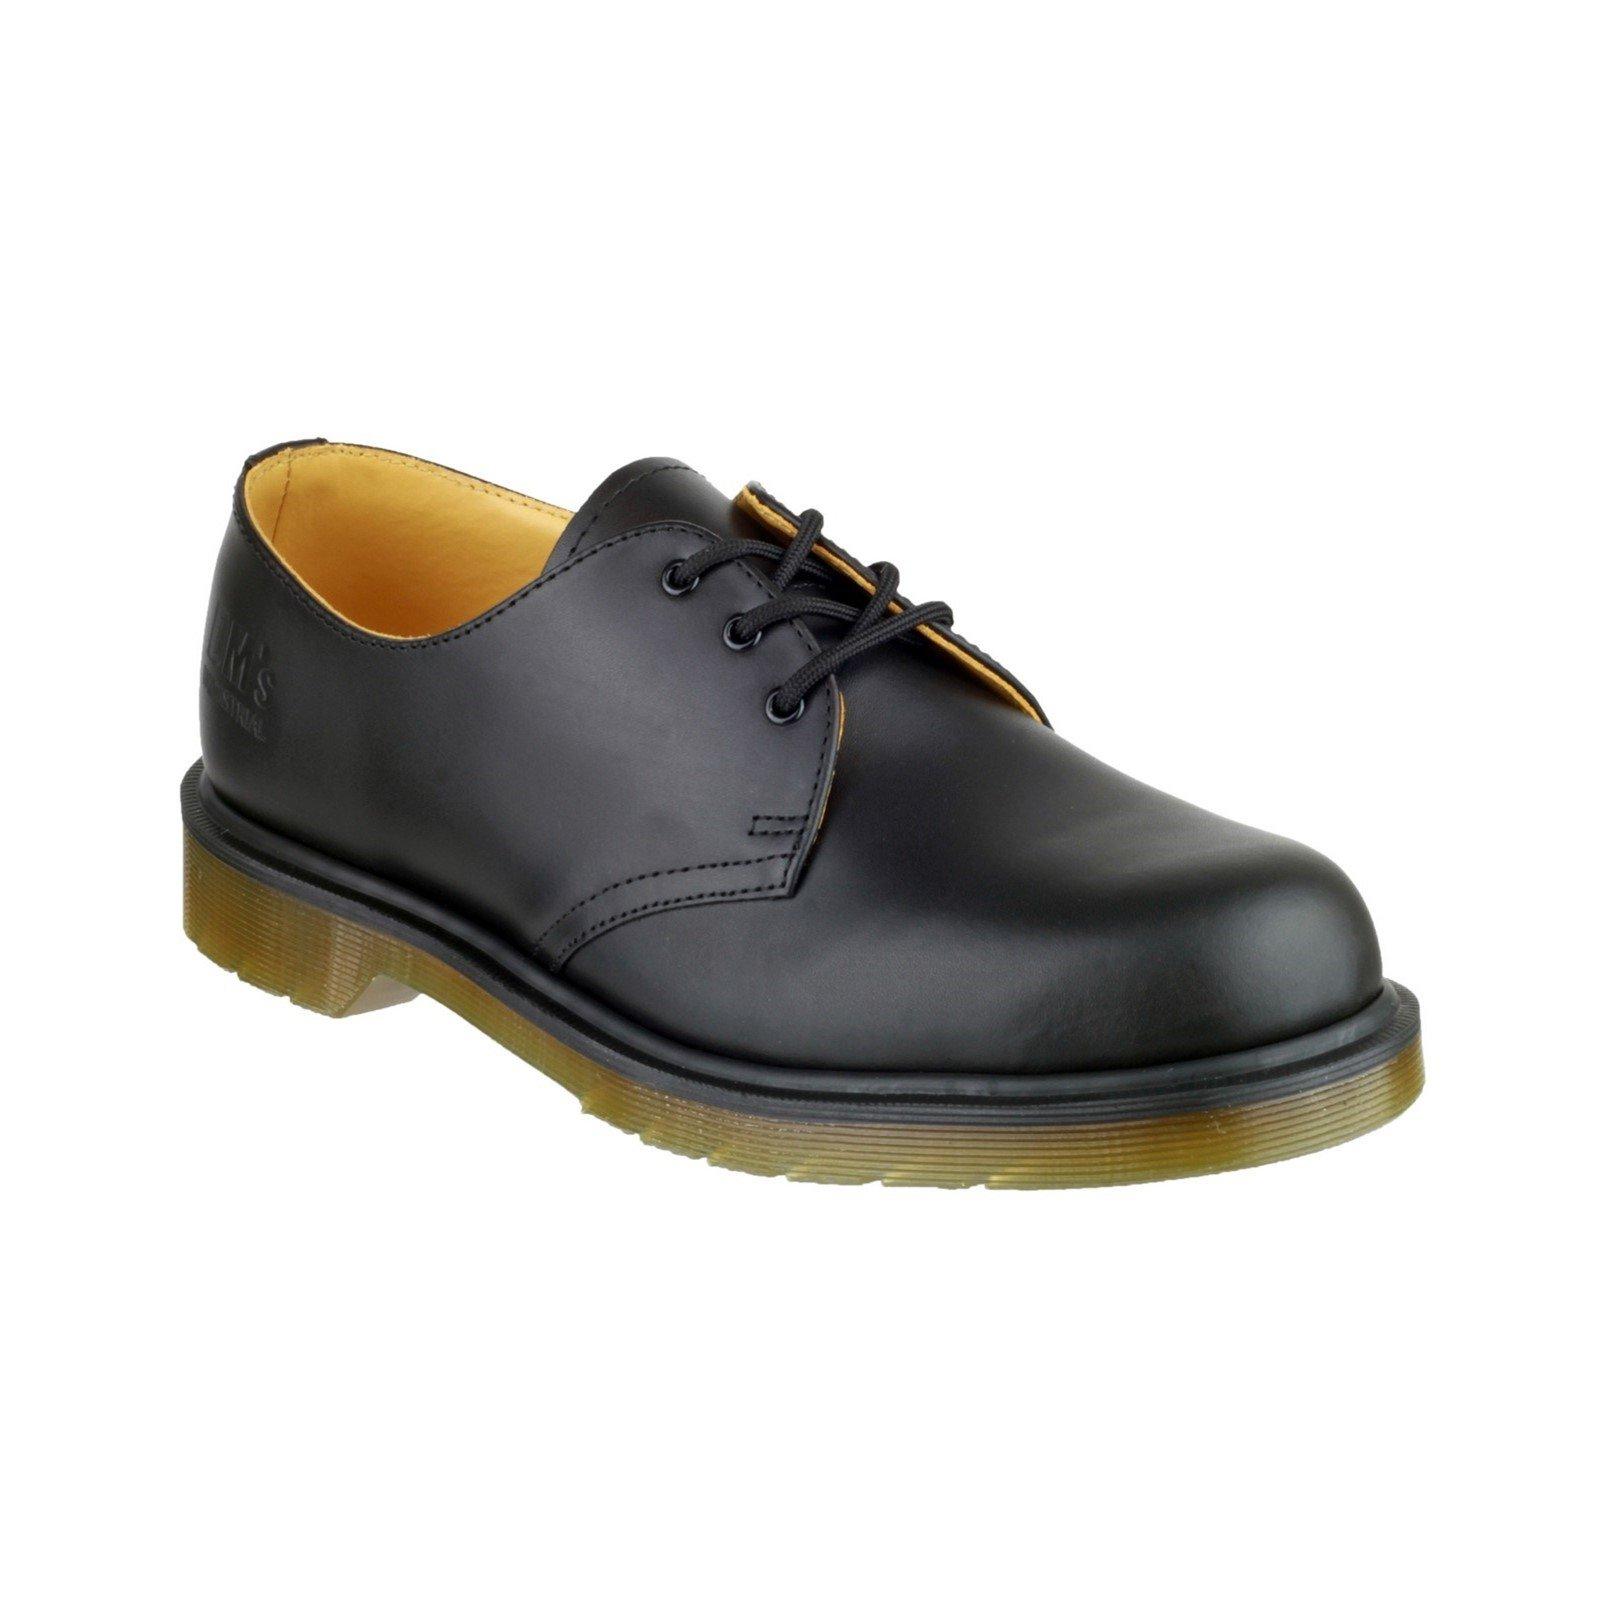 Dr Martens Men's Lace-Up Leather Derby Shoe Black 04915 - Black 5